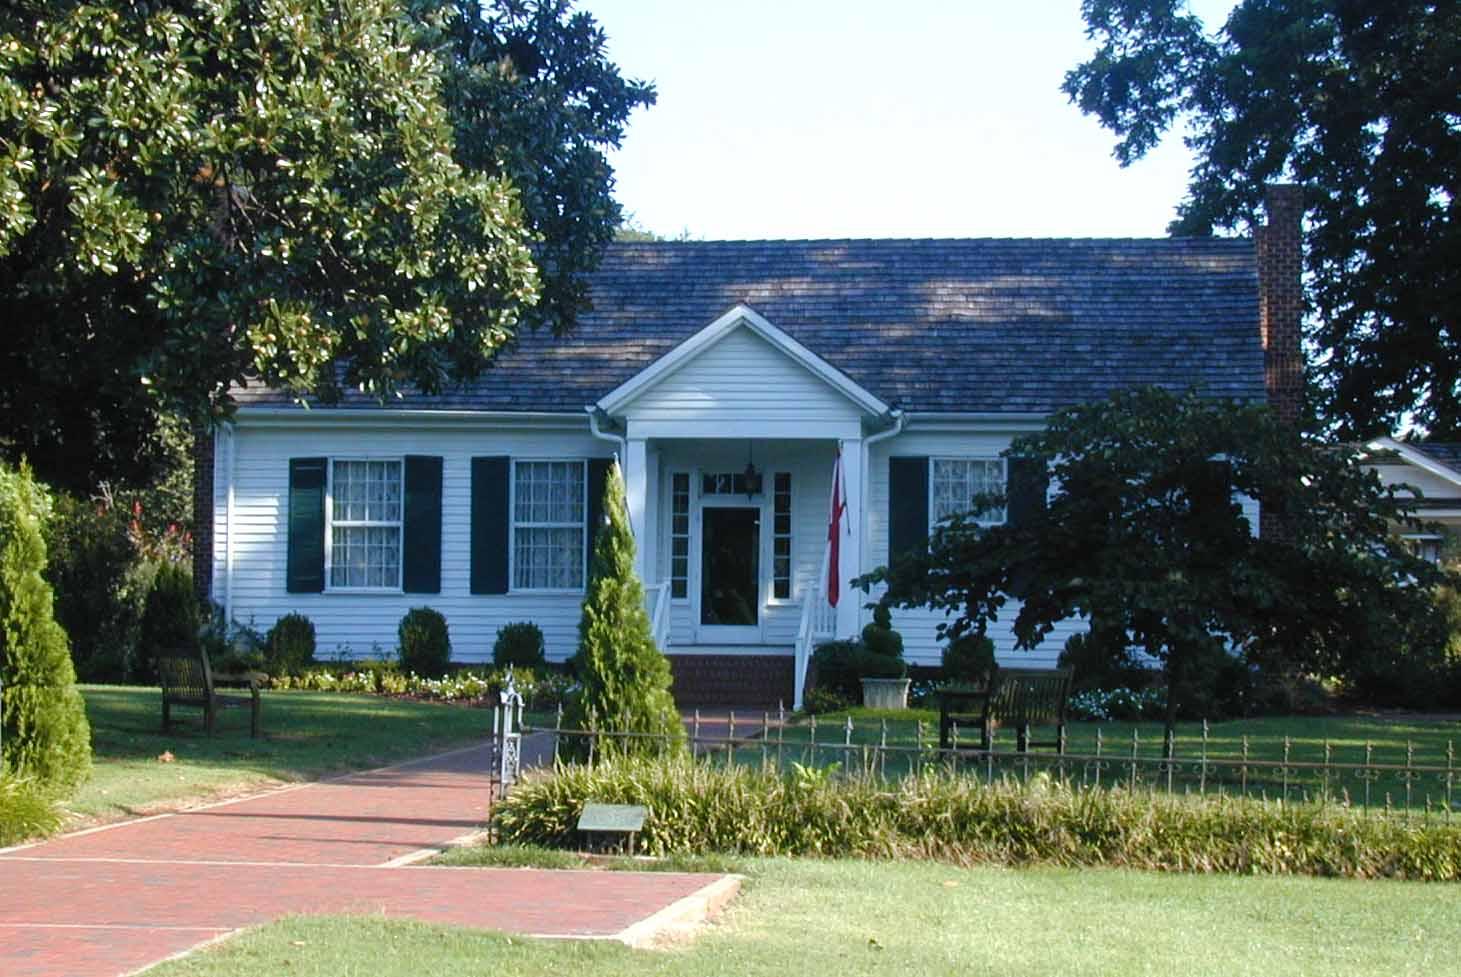 Helen Keller's Birthplace